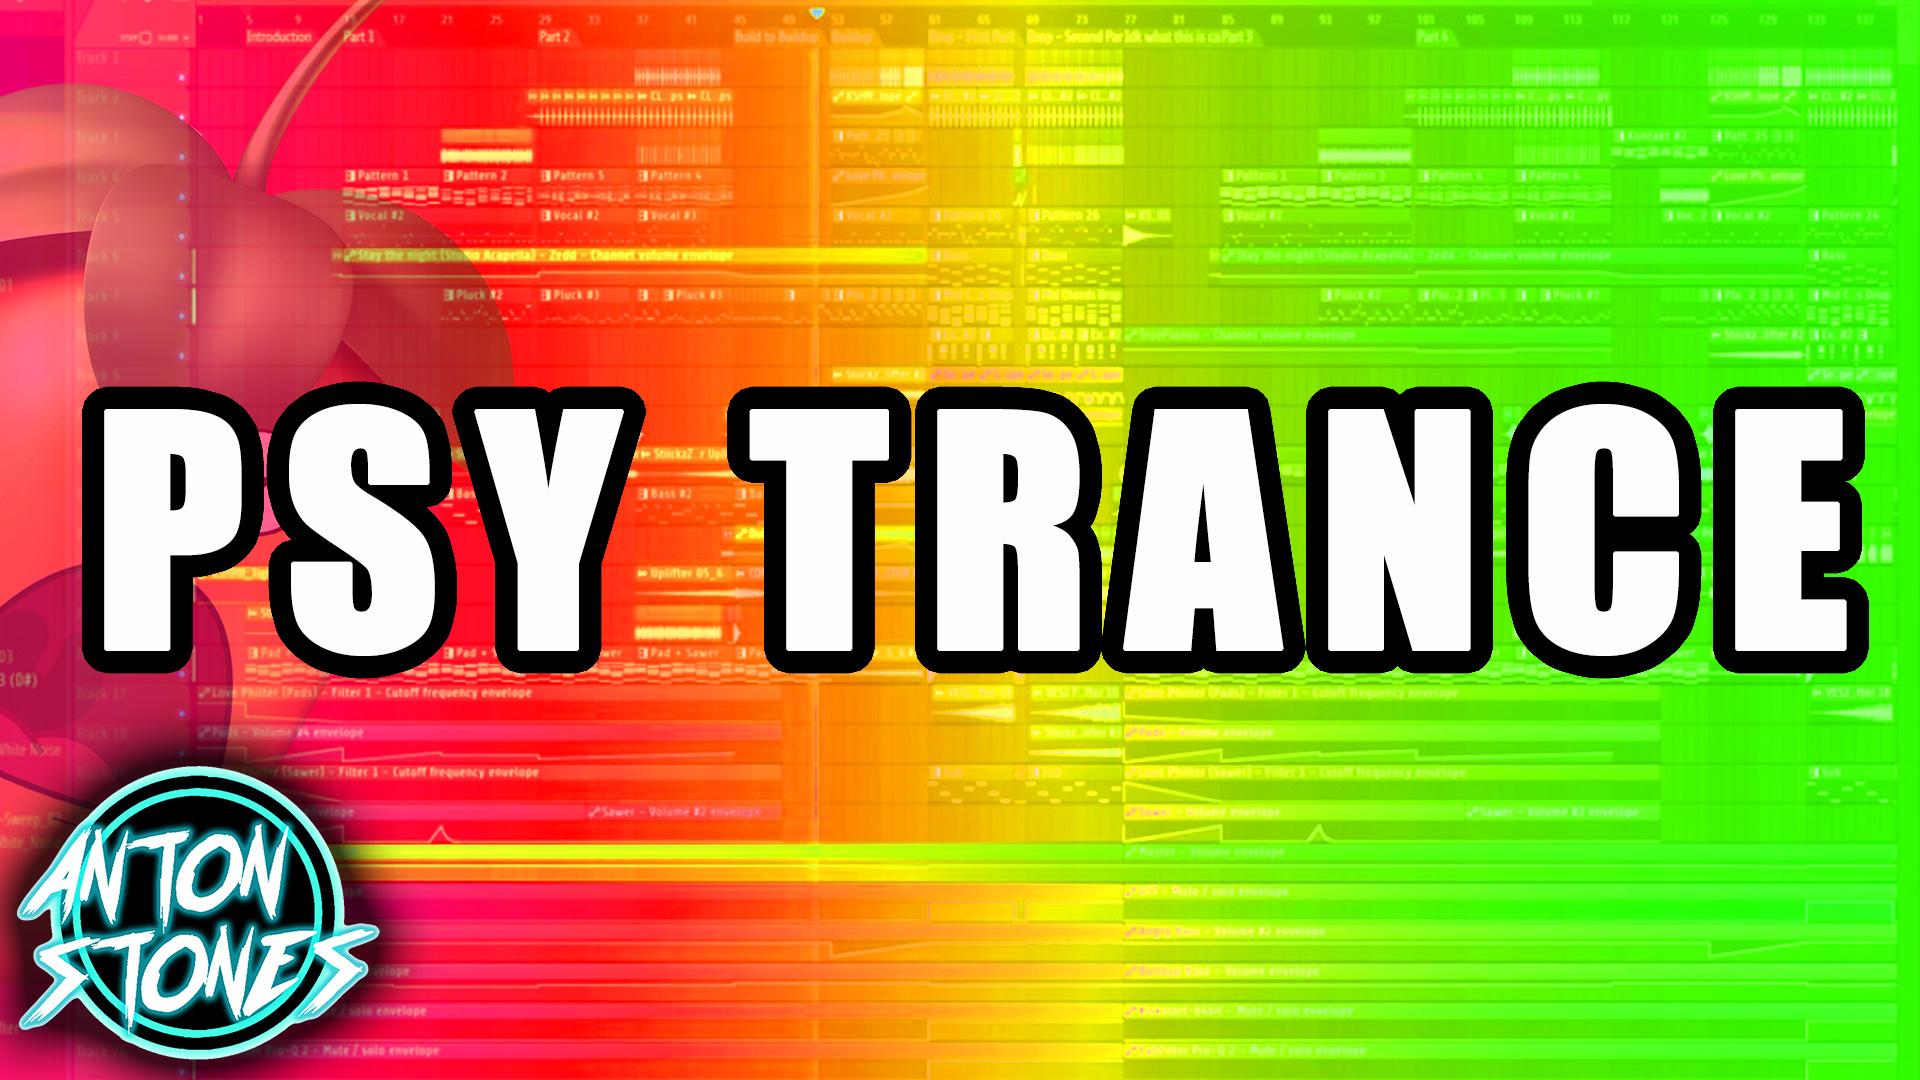 Psy Trance